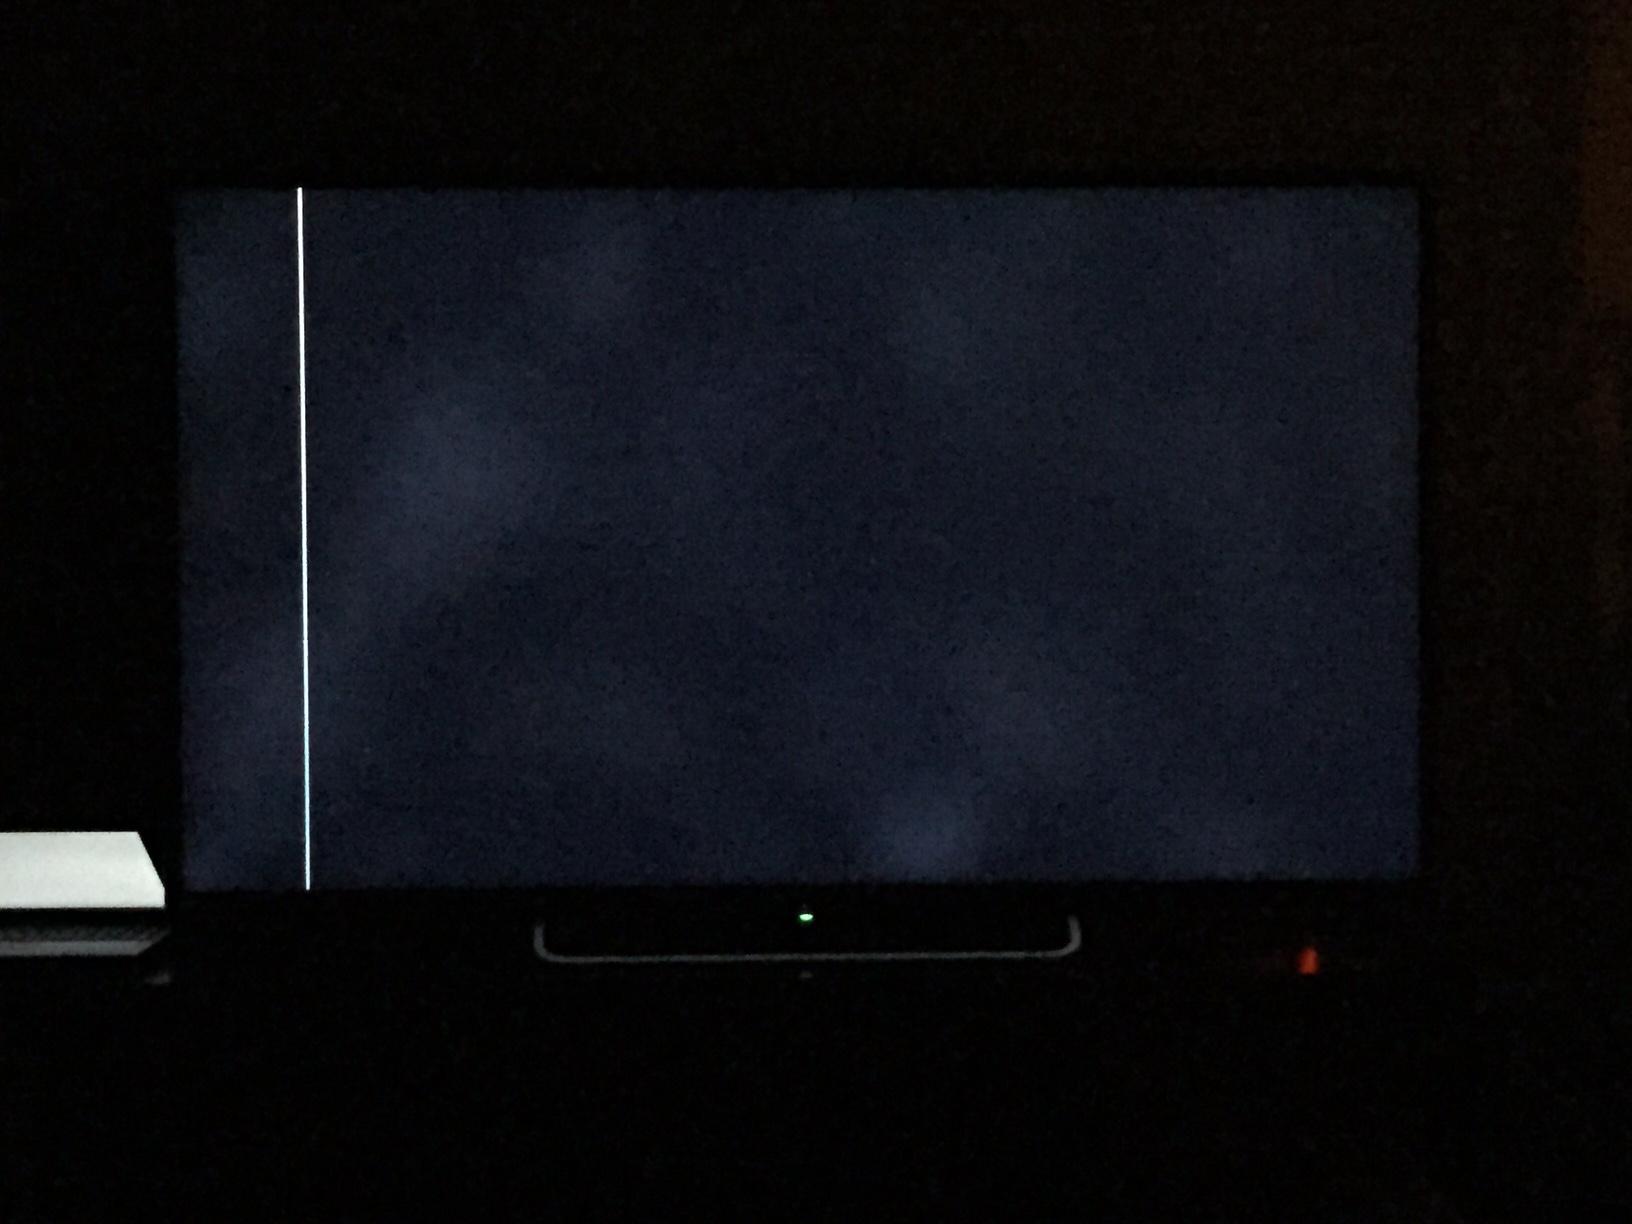 Solucionado sony kdl 60w605b manchas blancas sobre for Reparar pantalla televisor samsung